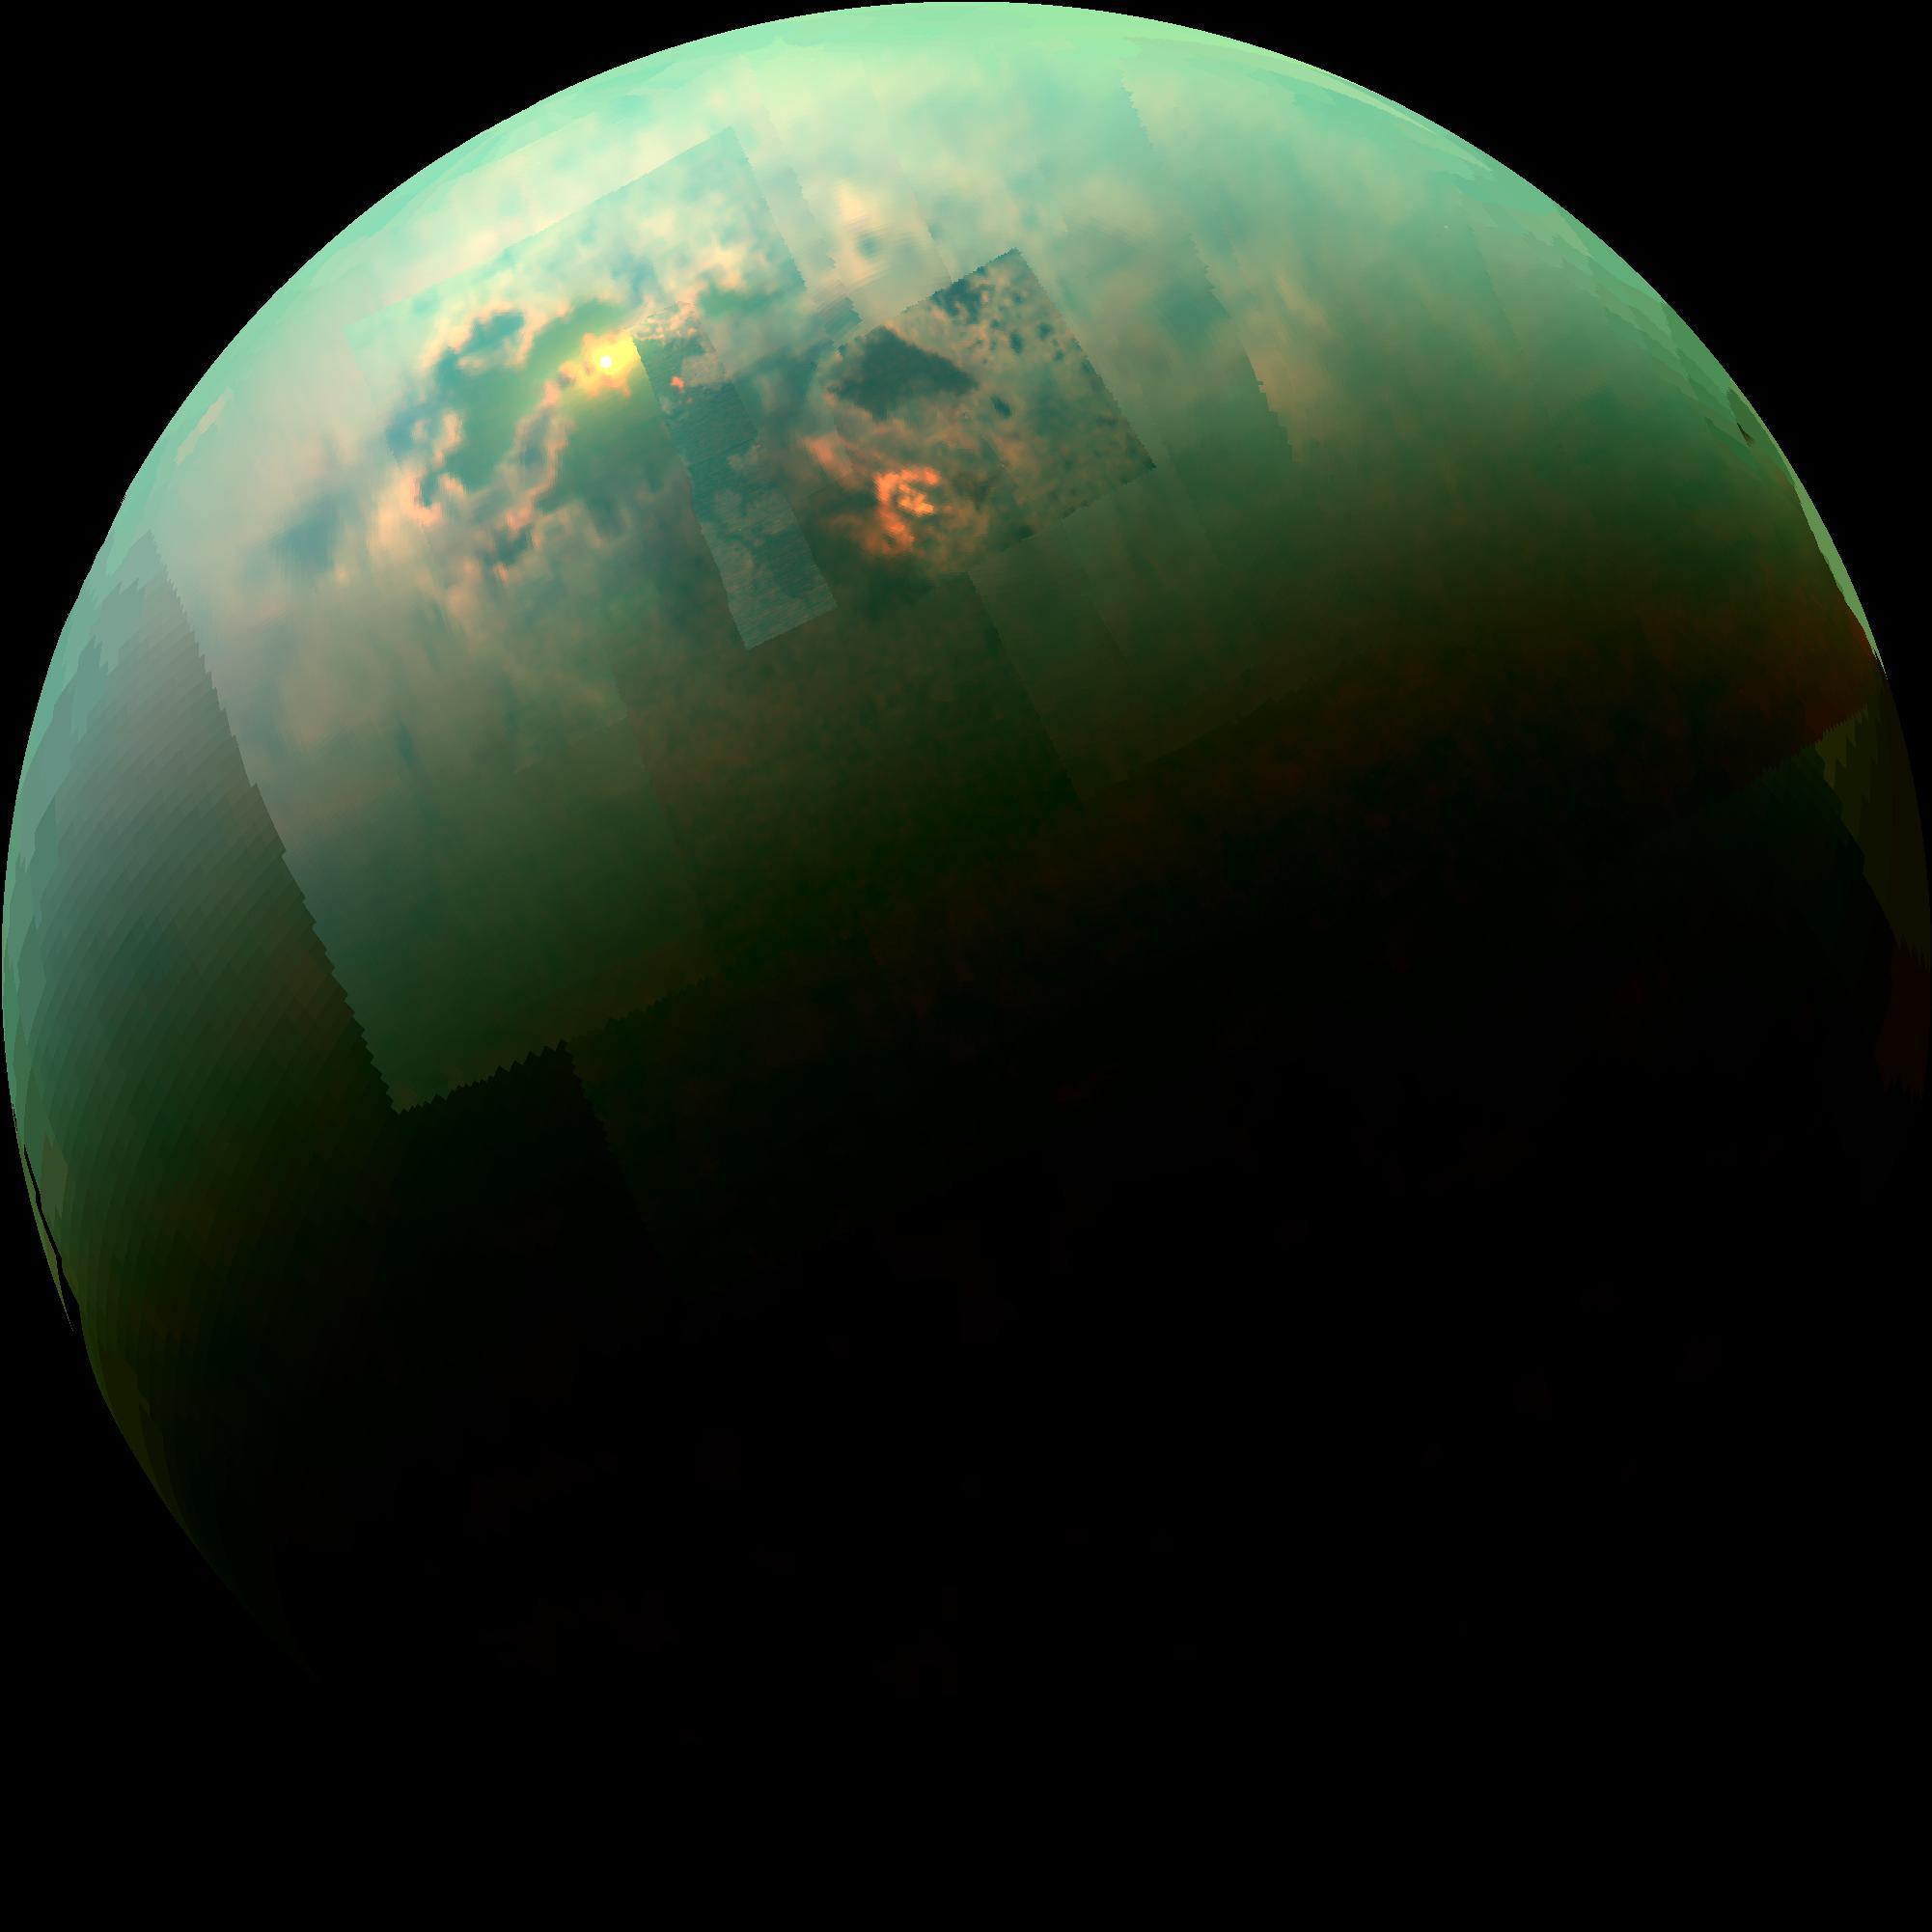 2015 February 2 - Titan Seas Reflect Sunlight